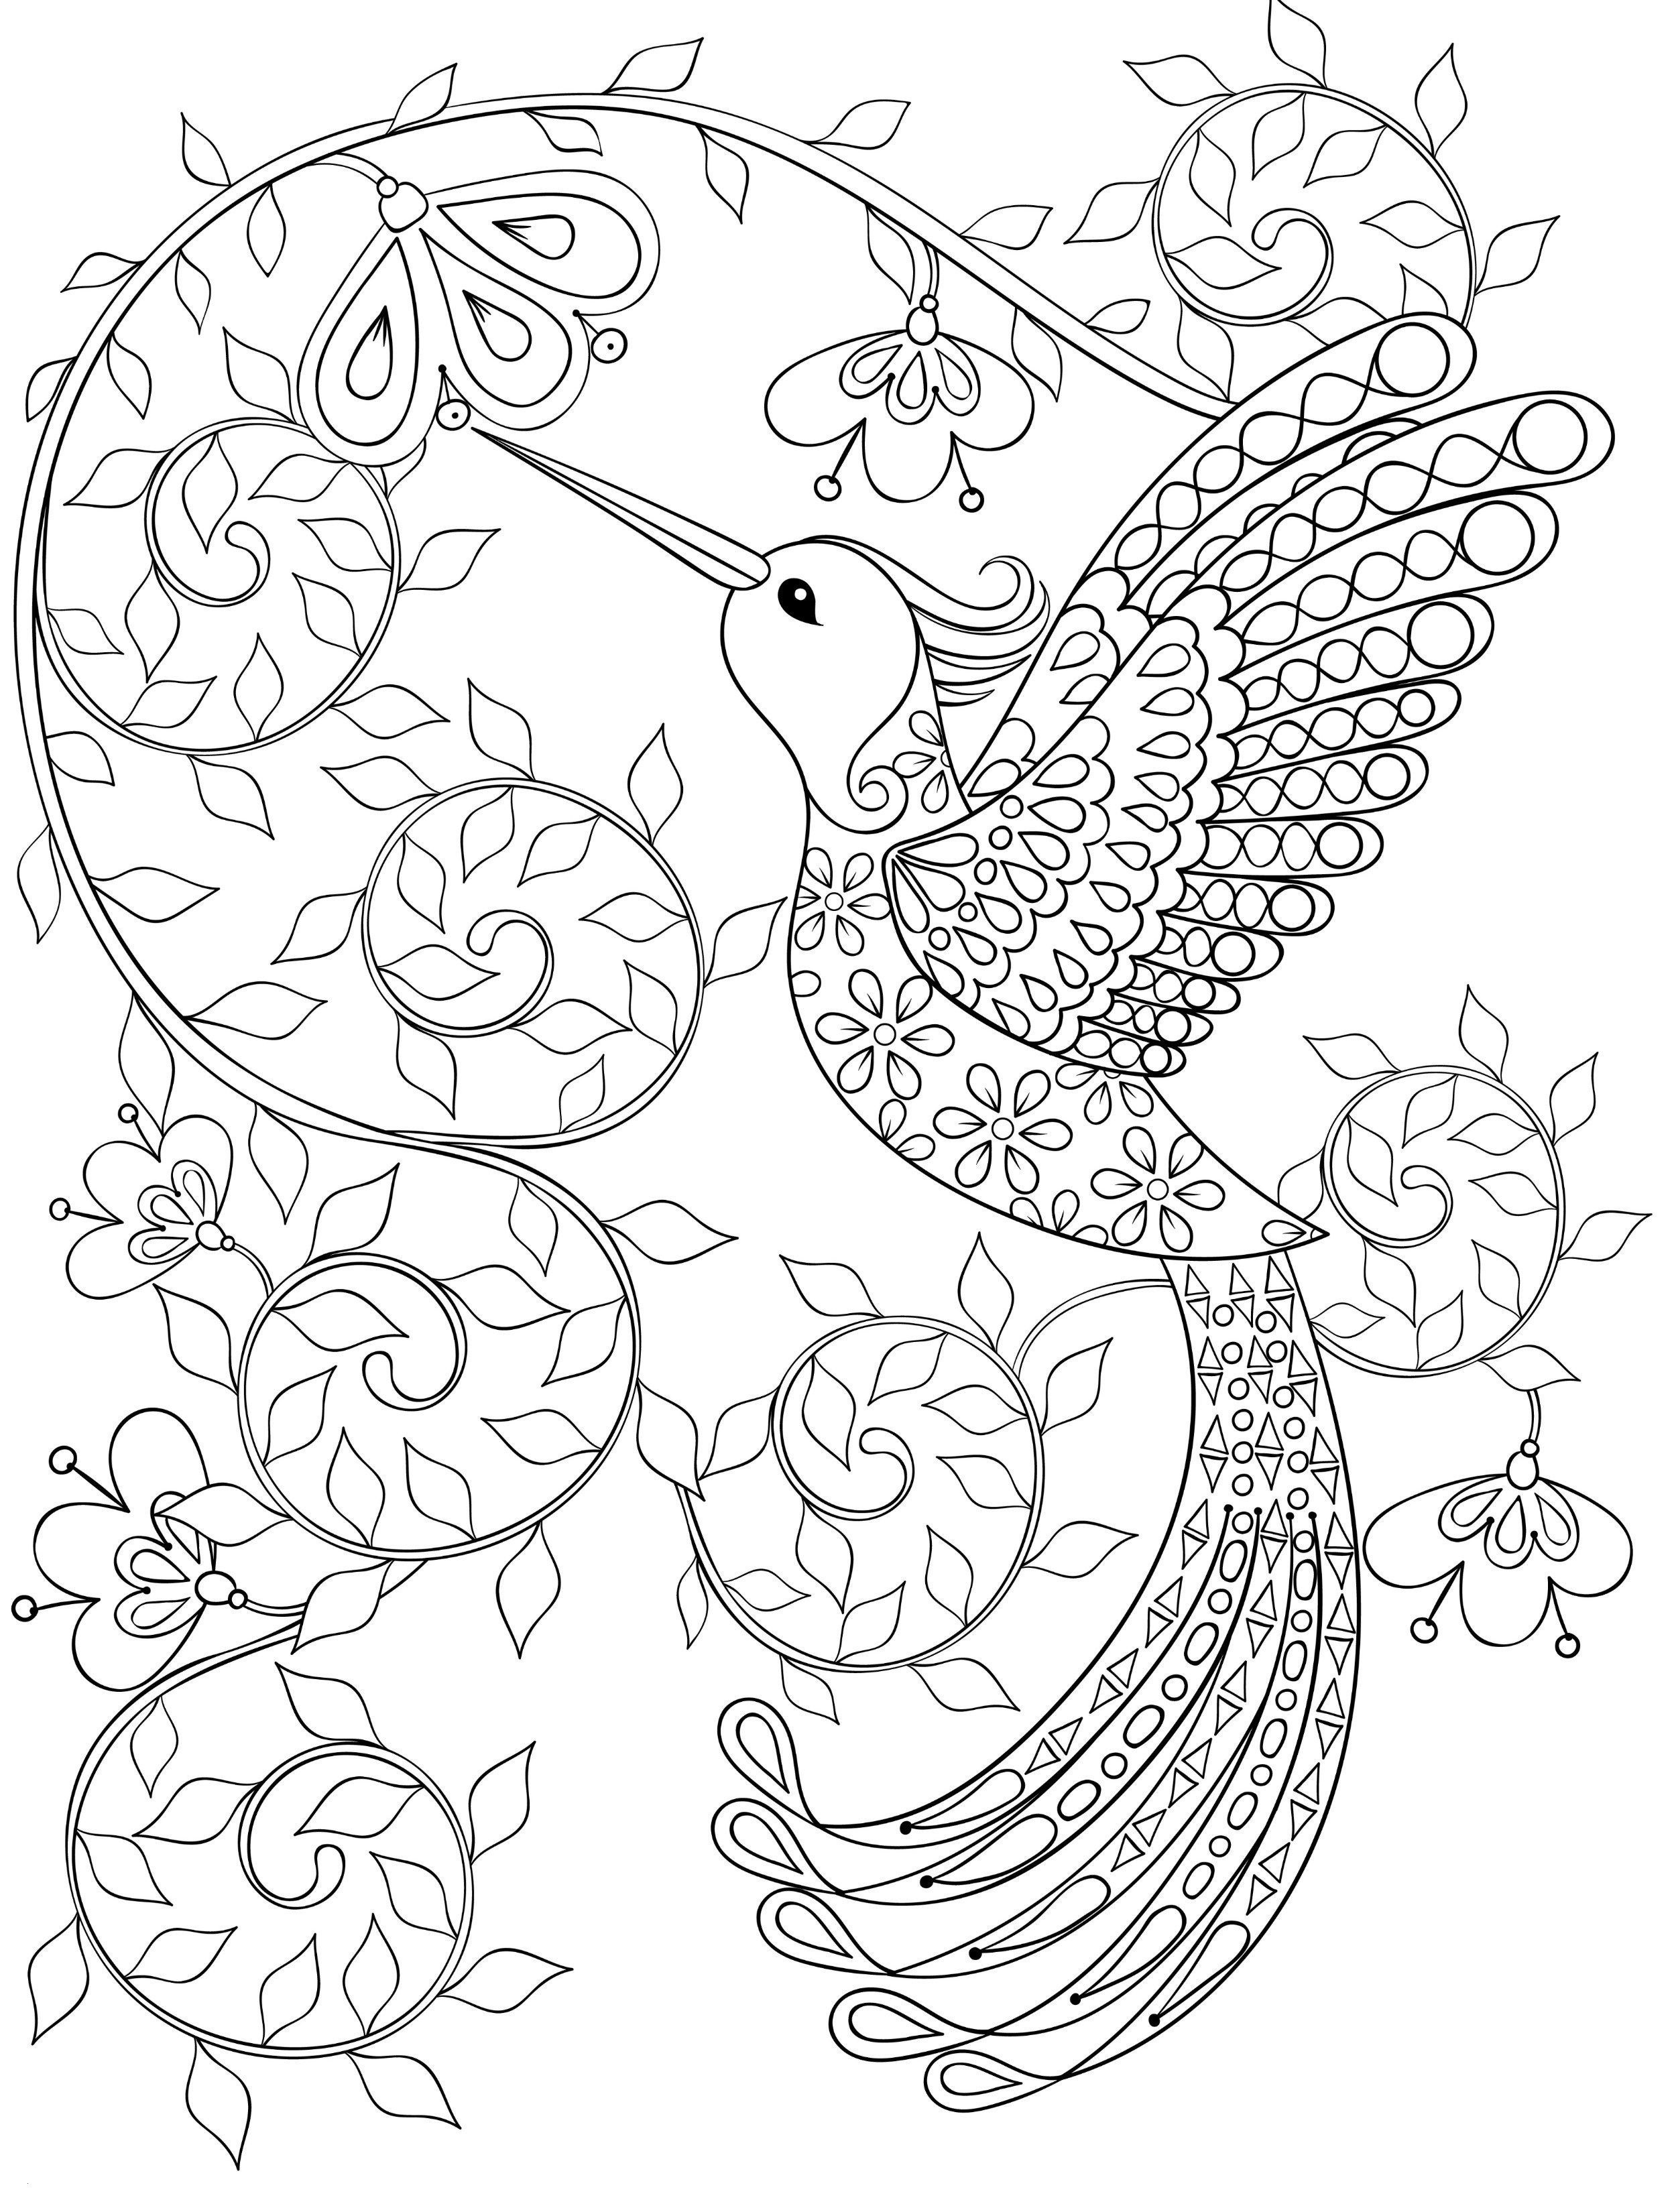 Ausmalbilder Meerjungfrau H2o Frisch 45 Elegant Ausmalbilder Meerjungfrau H2o Beste Malvorlage Galerie